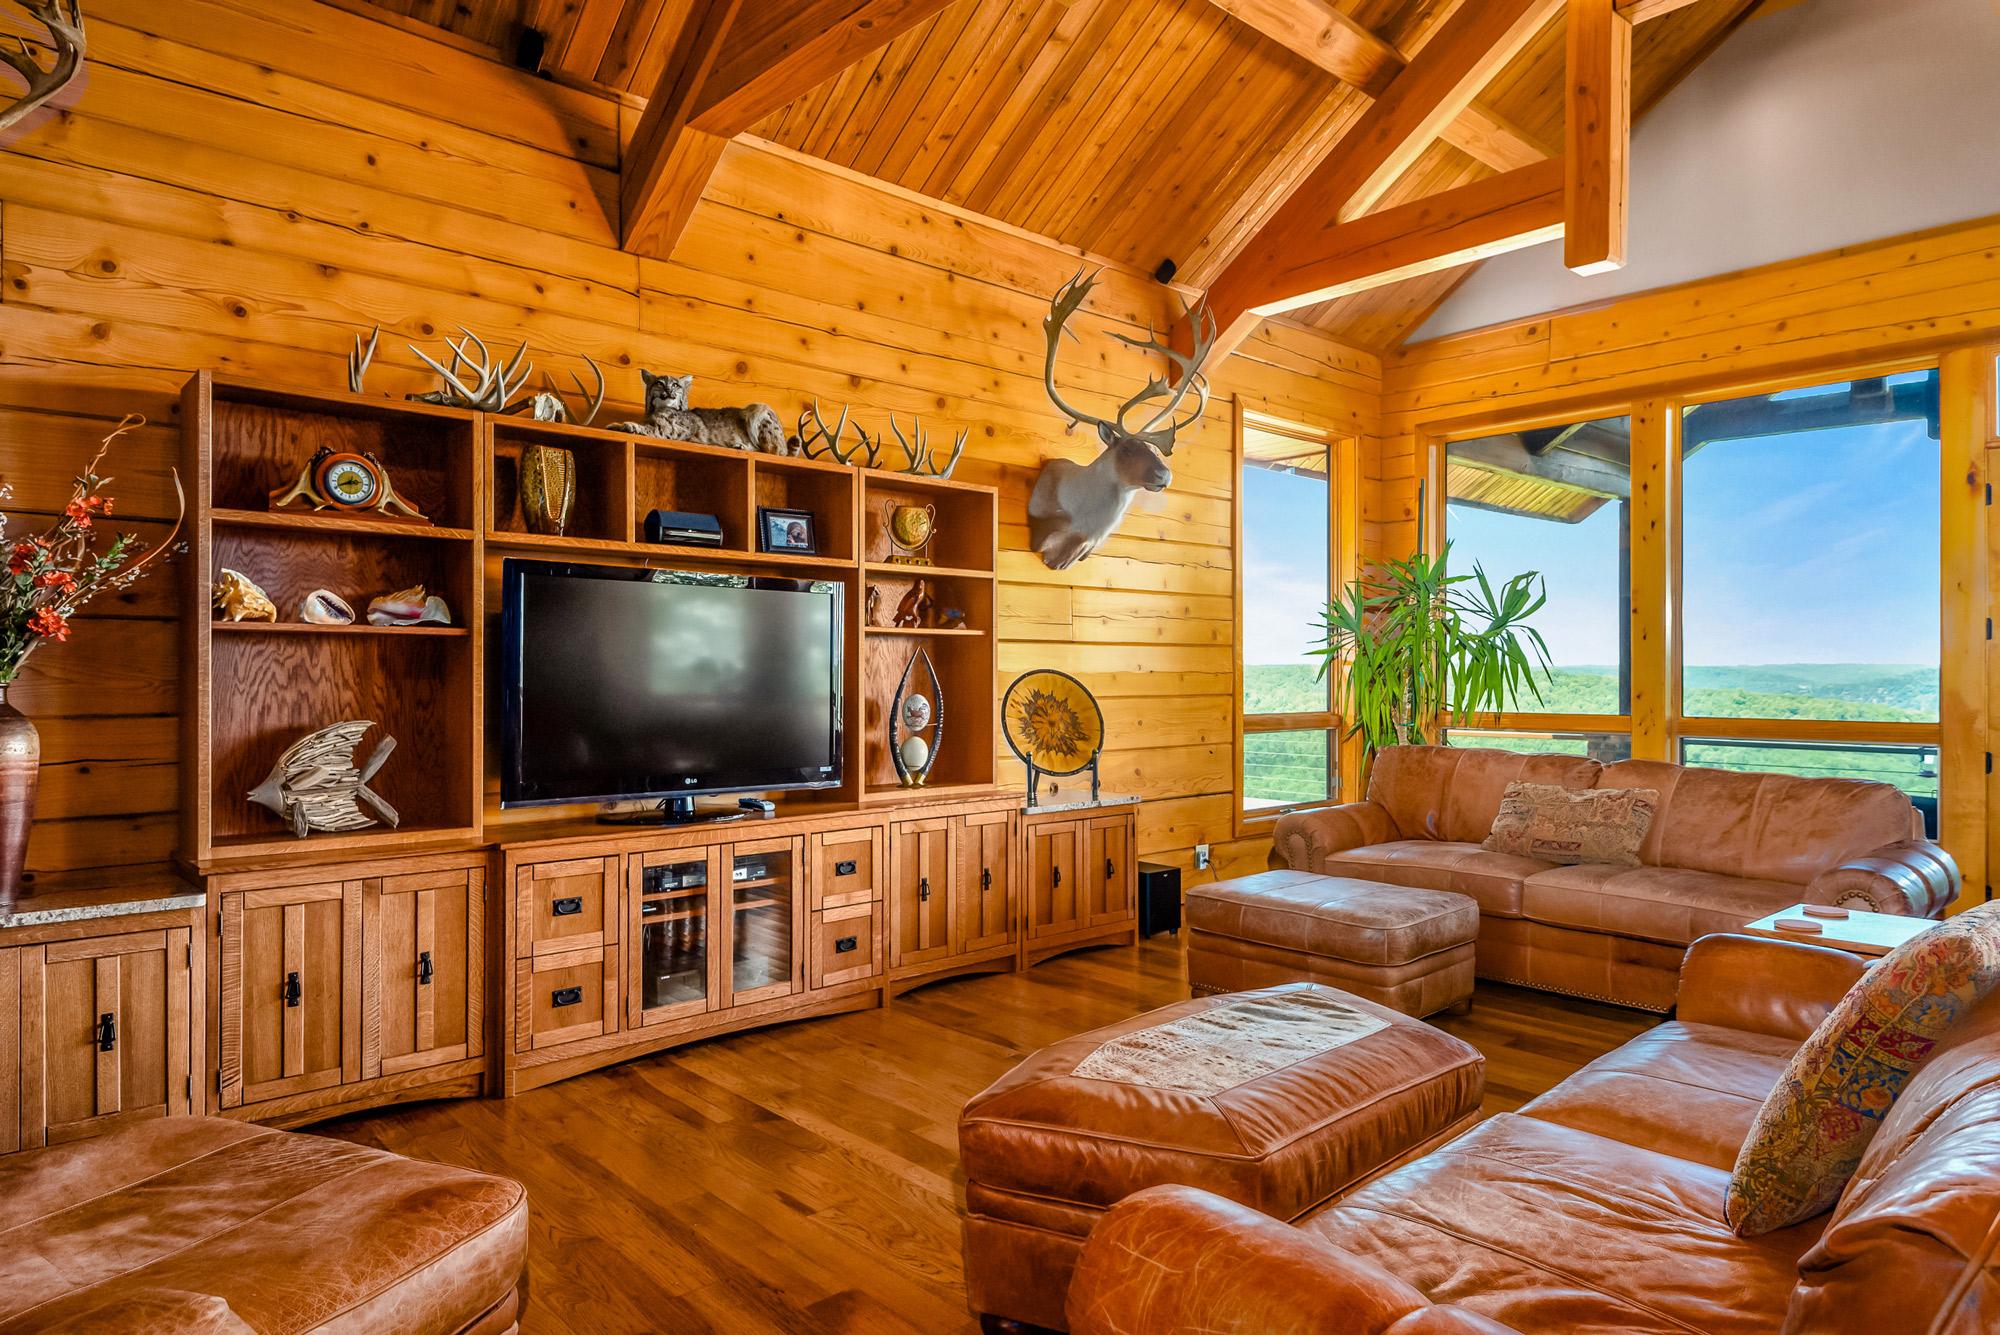 The White River Inn, Cotter, AR, Fly Fishing Lodge